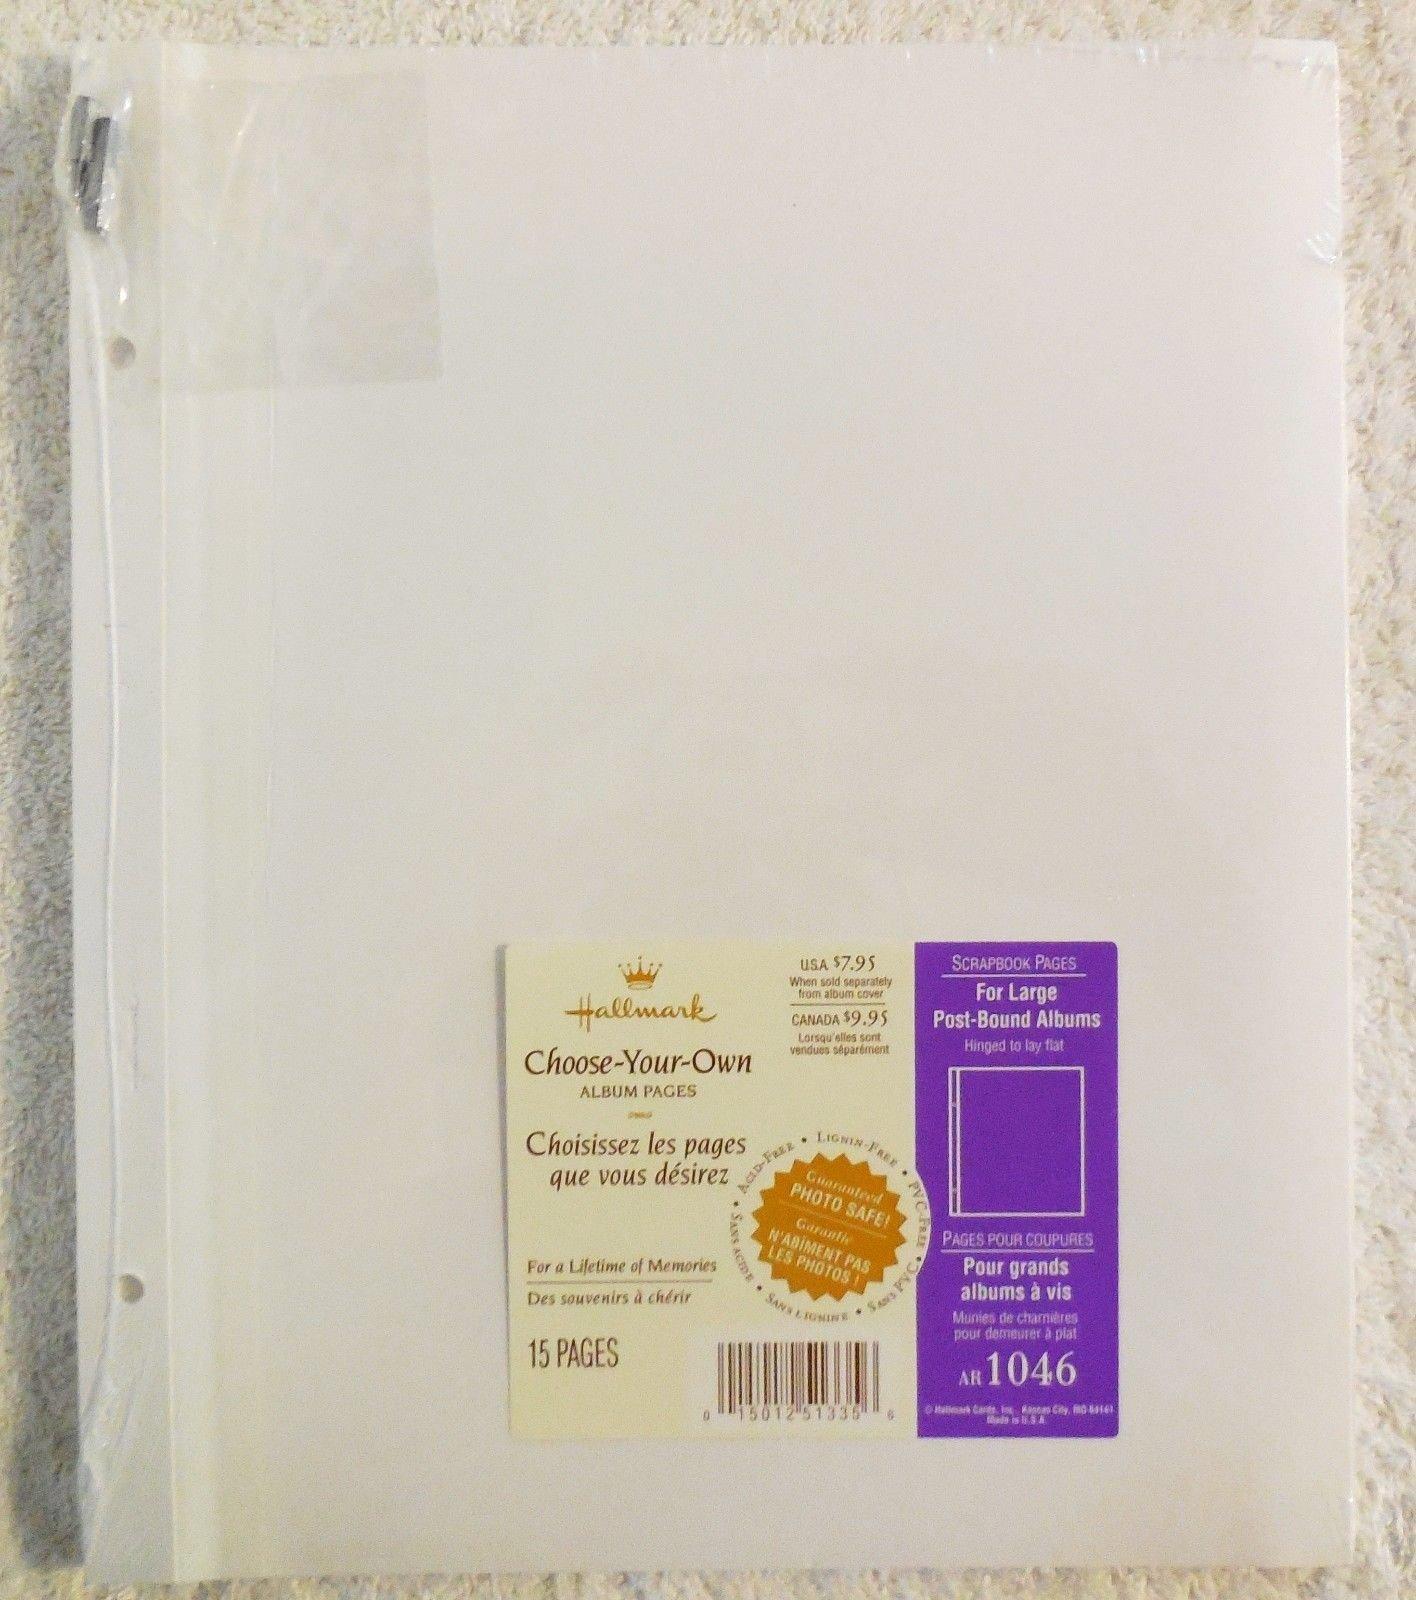 Hallmark Choose-Your-Own Album Pages AR 1046